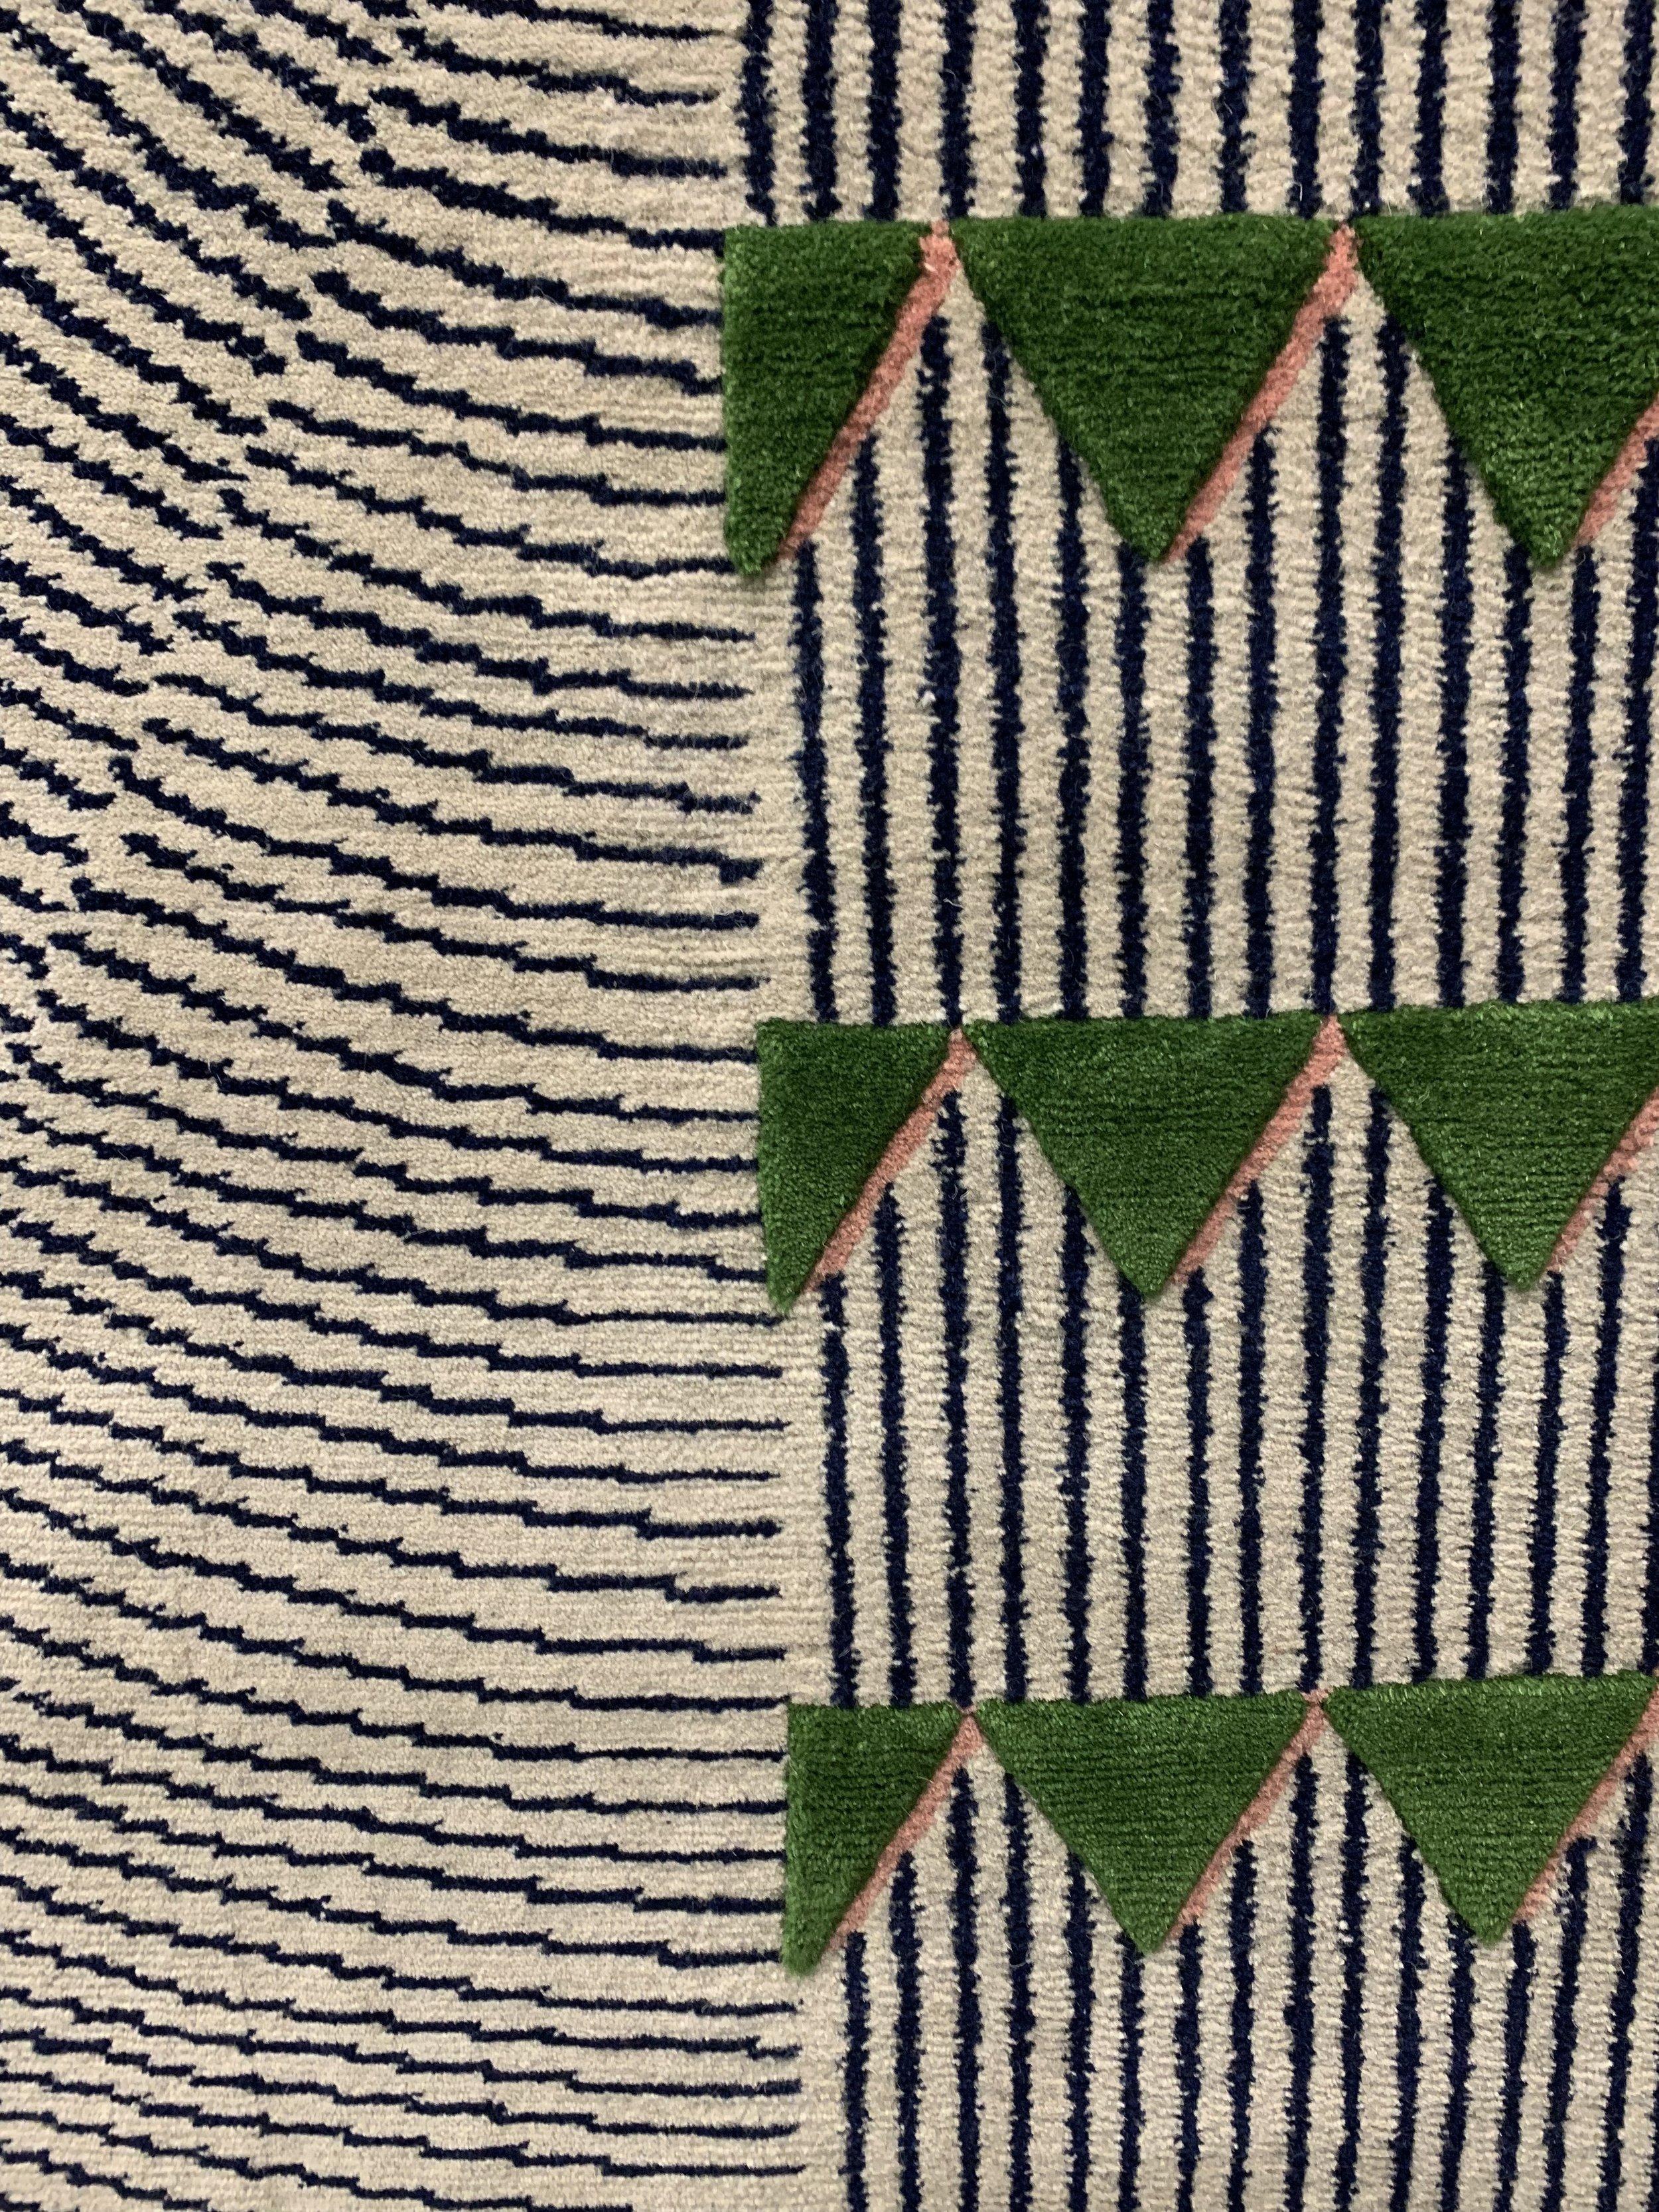 by David/Nicolas; hand-woven beauties!